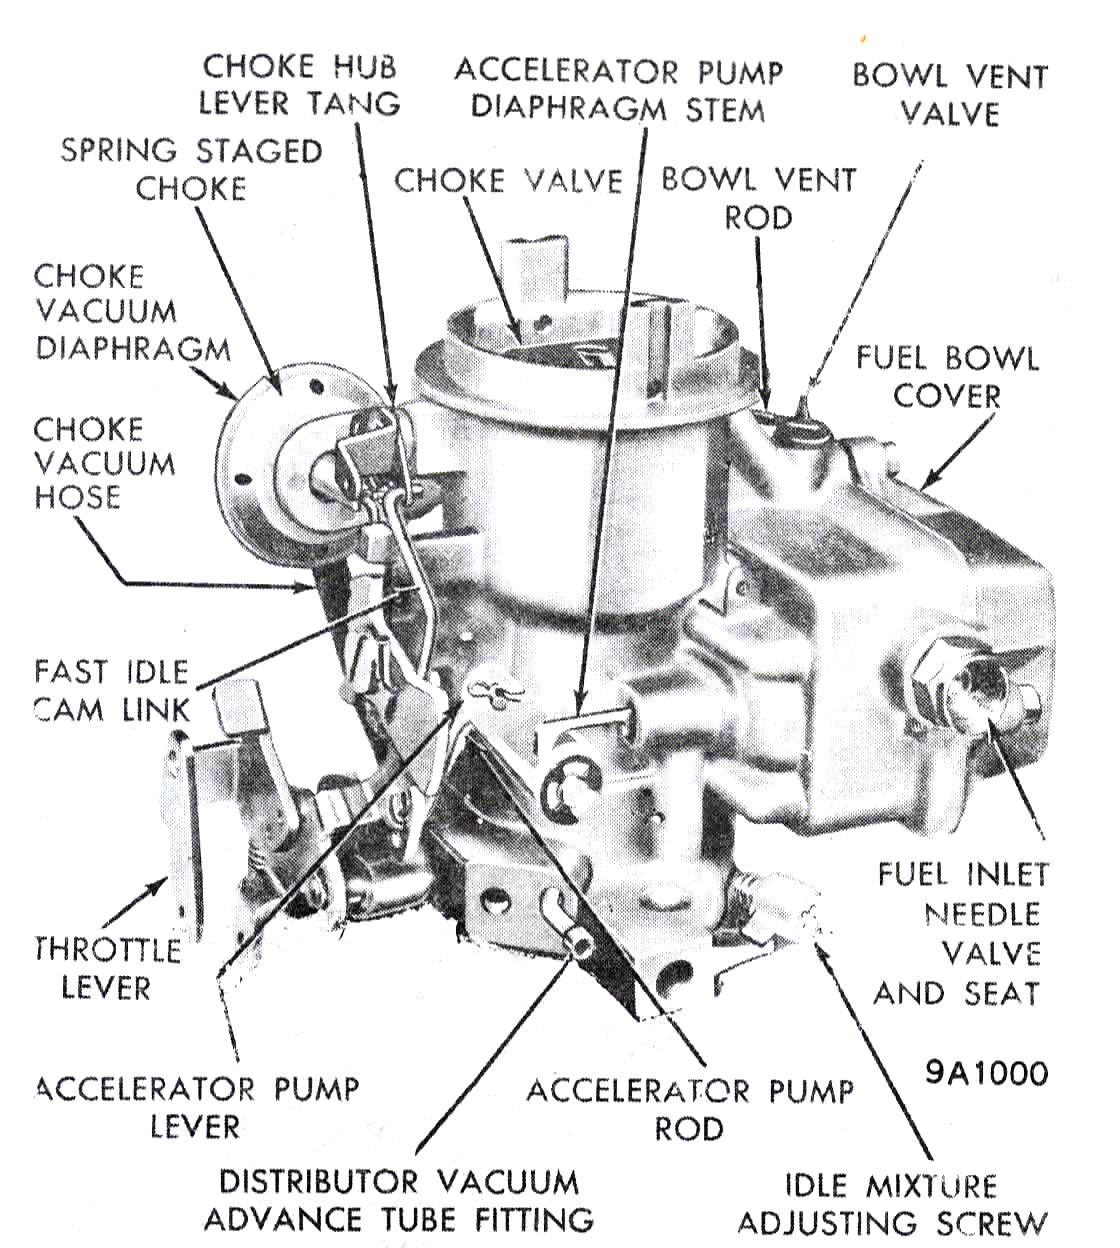 rochester 4 barrel carburetor diagram 1987 ez go gas golf cart wiring holley 1920 technical help